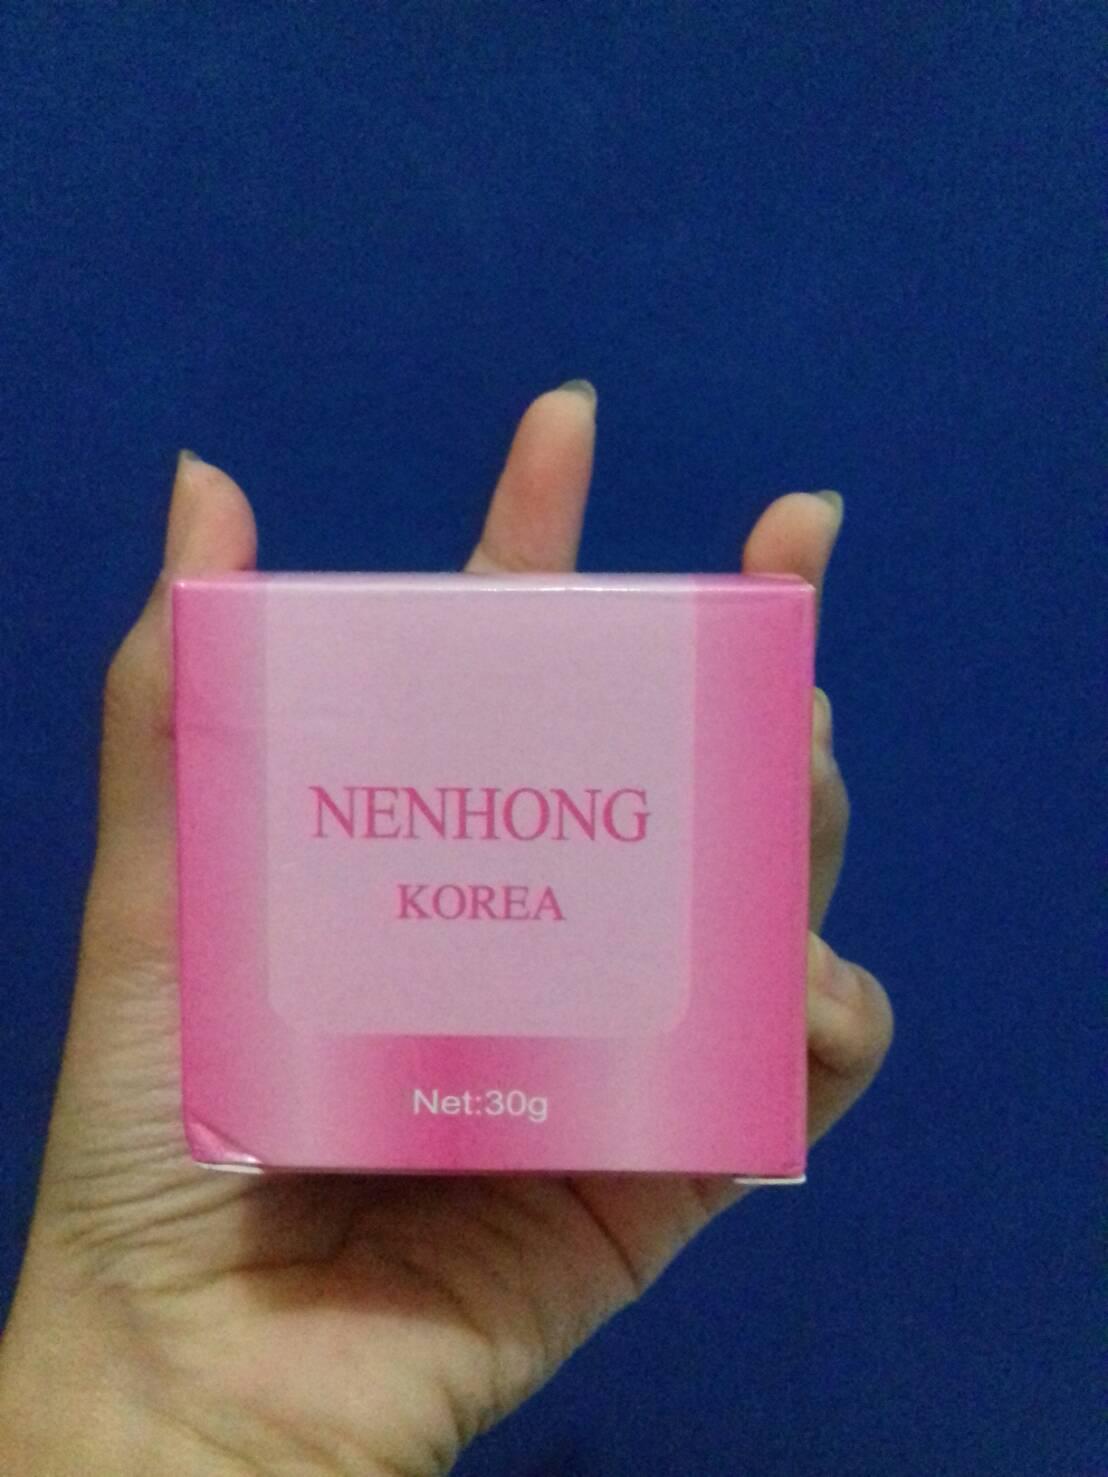 Boboho Review Nenhong Korea Pemerah Bibir Original Ini Berfungsi Untuk Mencerahkan Hingga Pink Natural Sama Membuat Menjadi Lembab Oh Iya Bukan Buat Saja Sih Yang Aku Tau